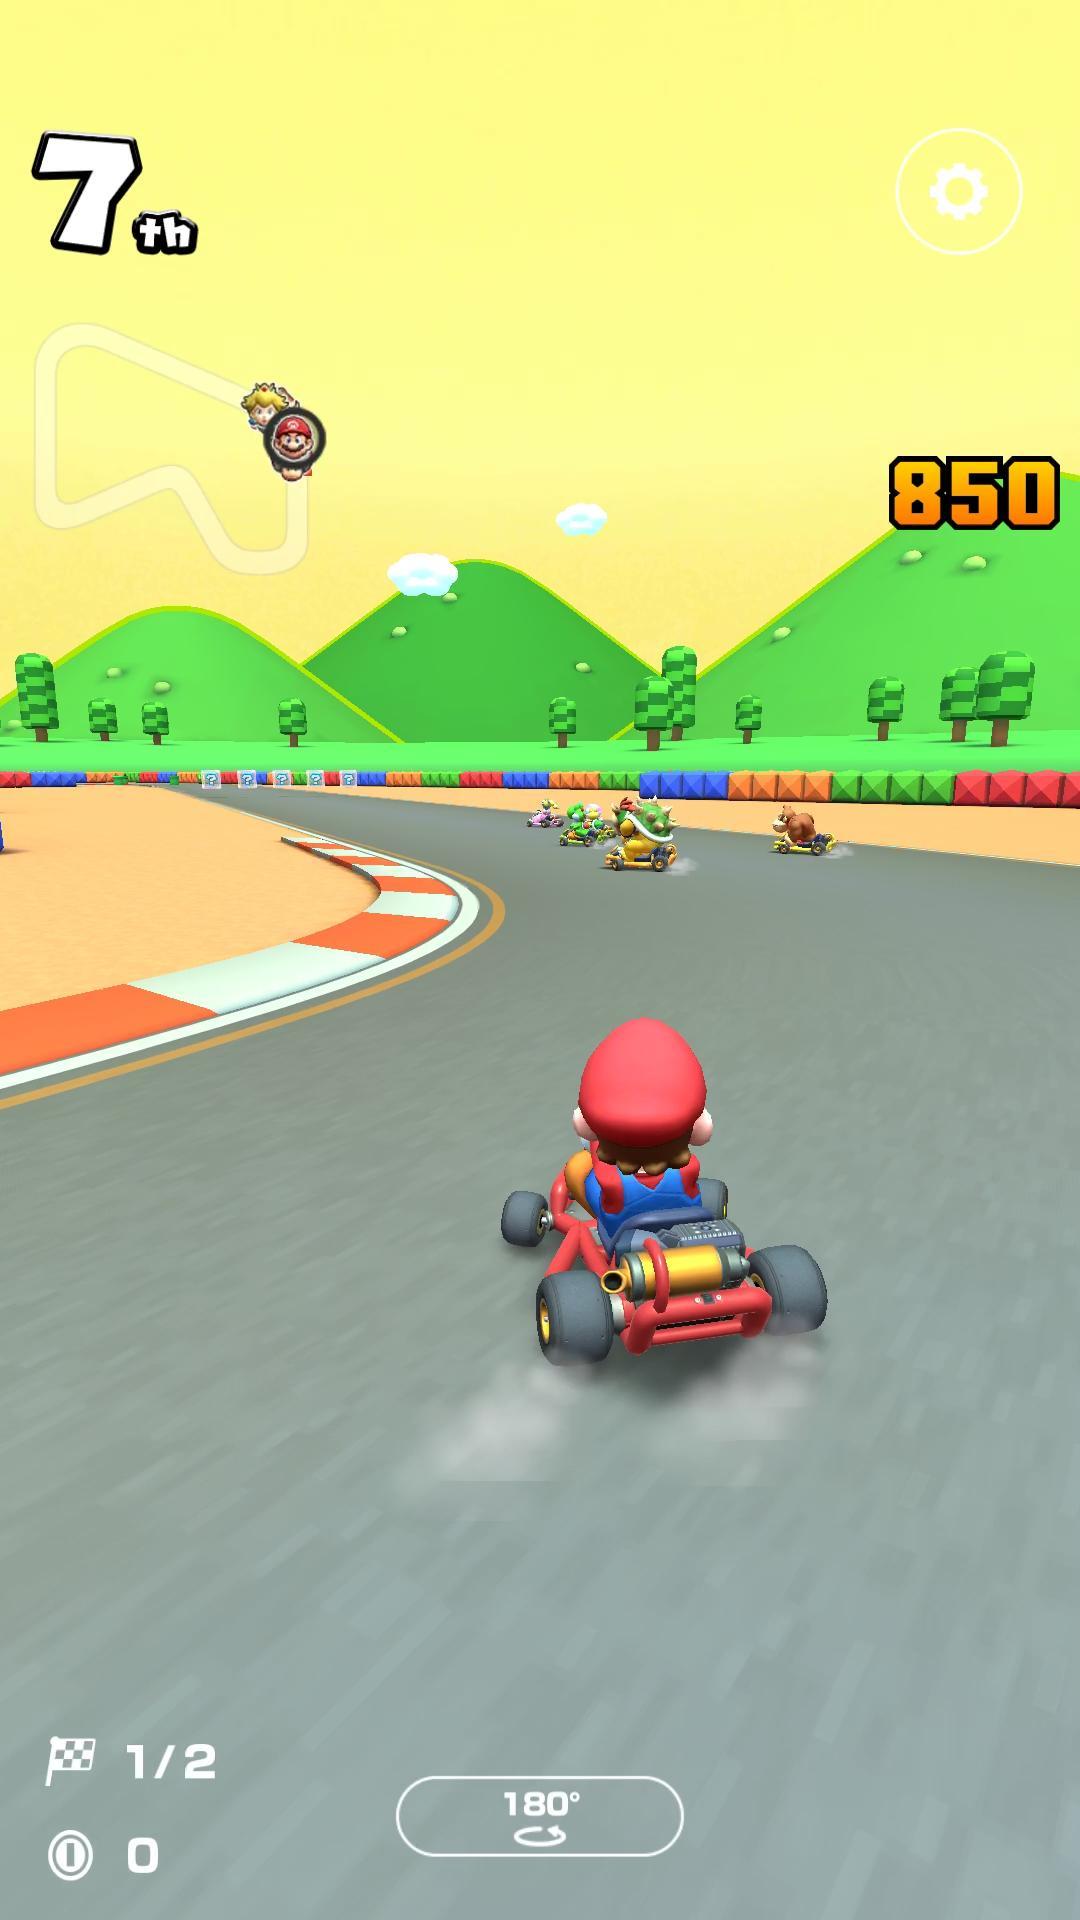 Mario Kart Tour 2.1.1 Screenshot 8